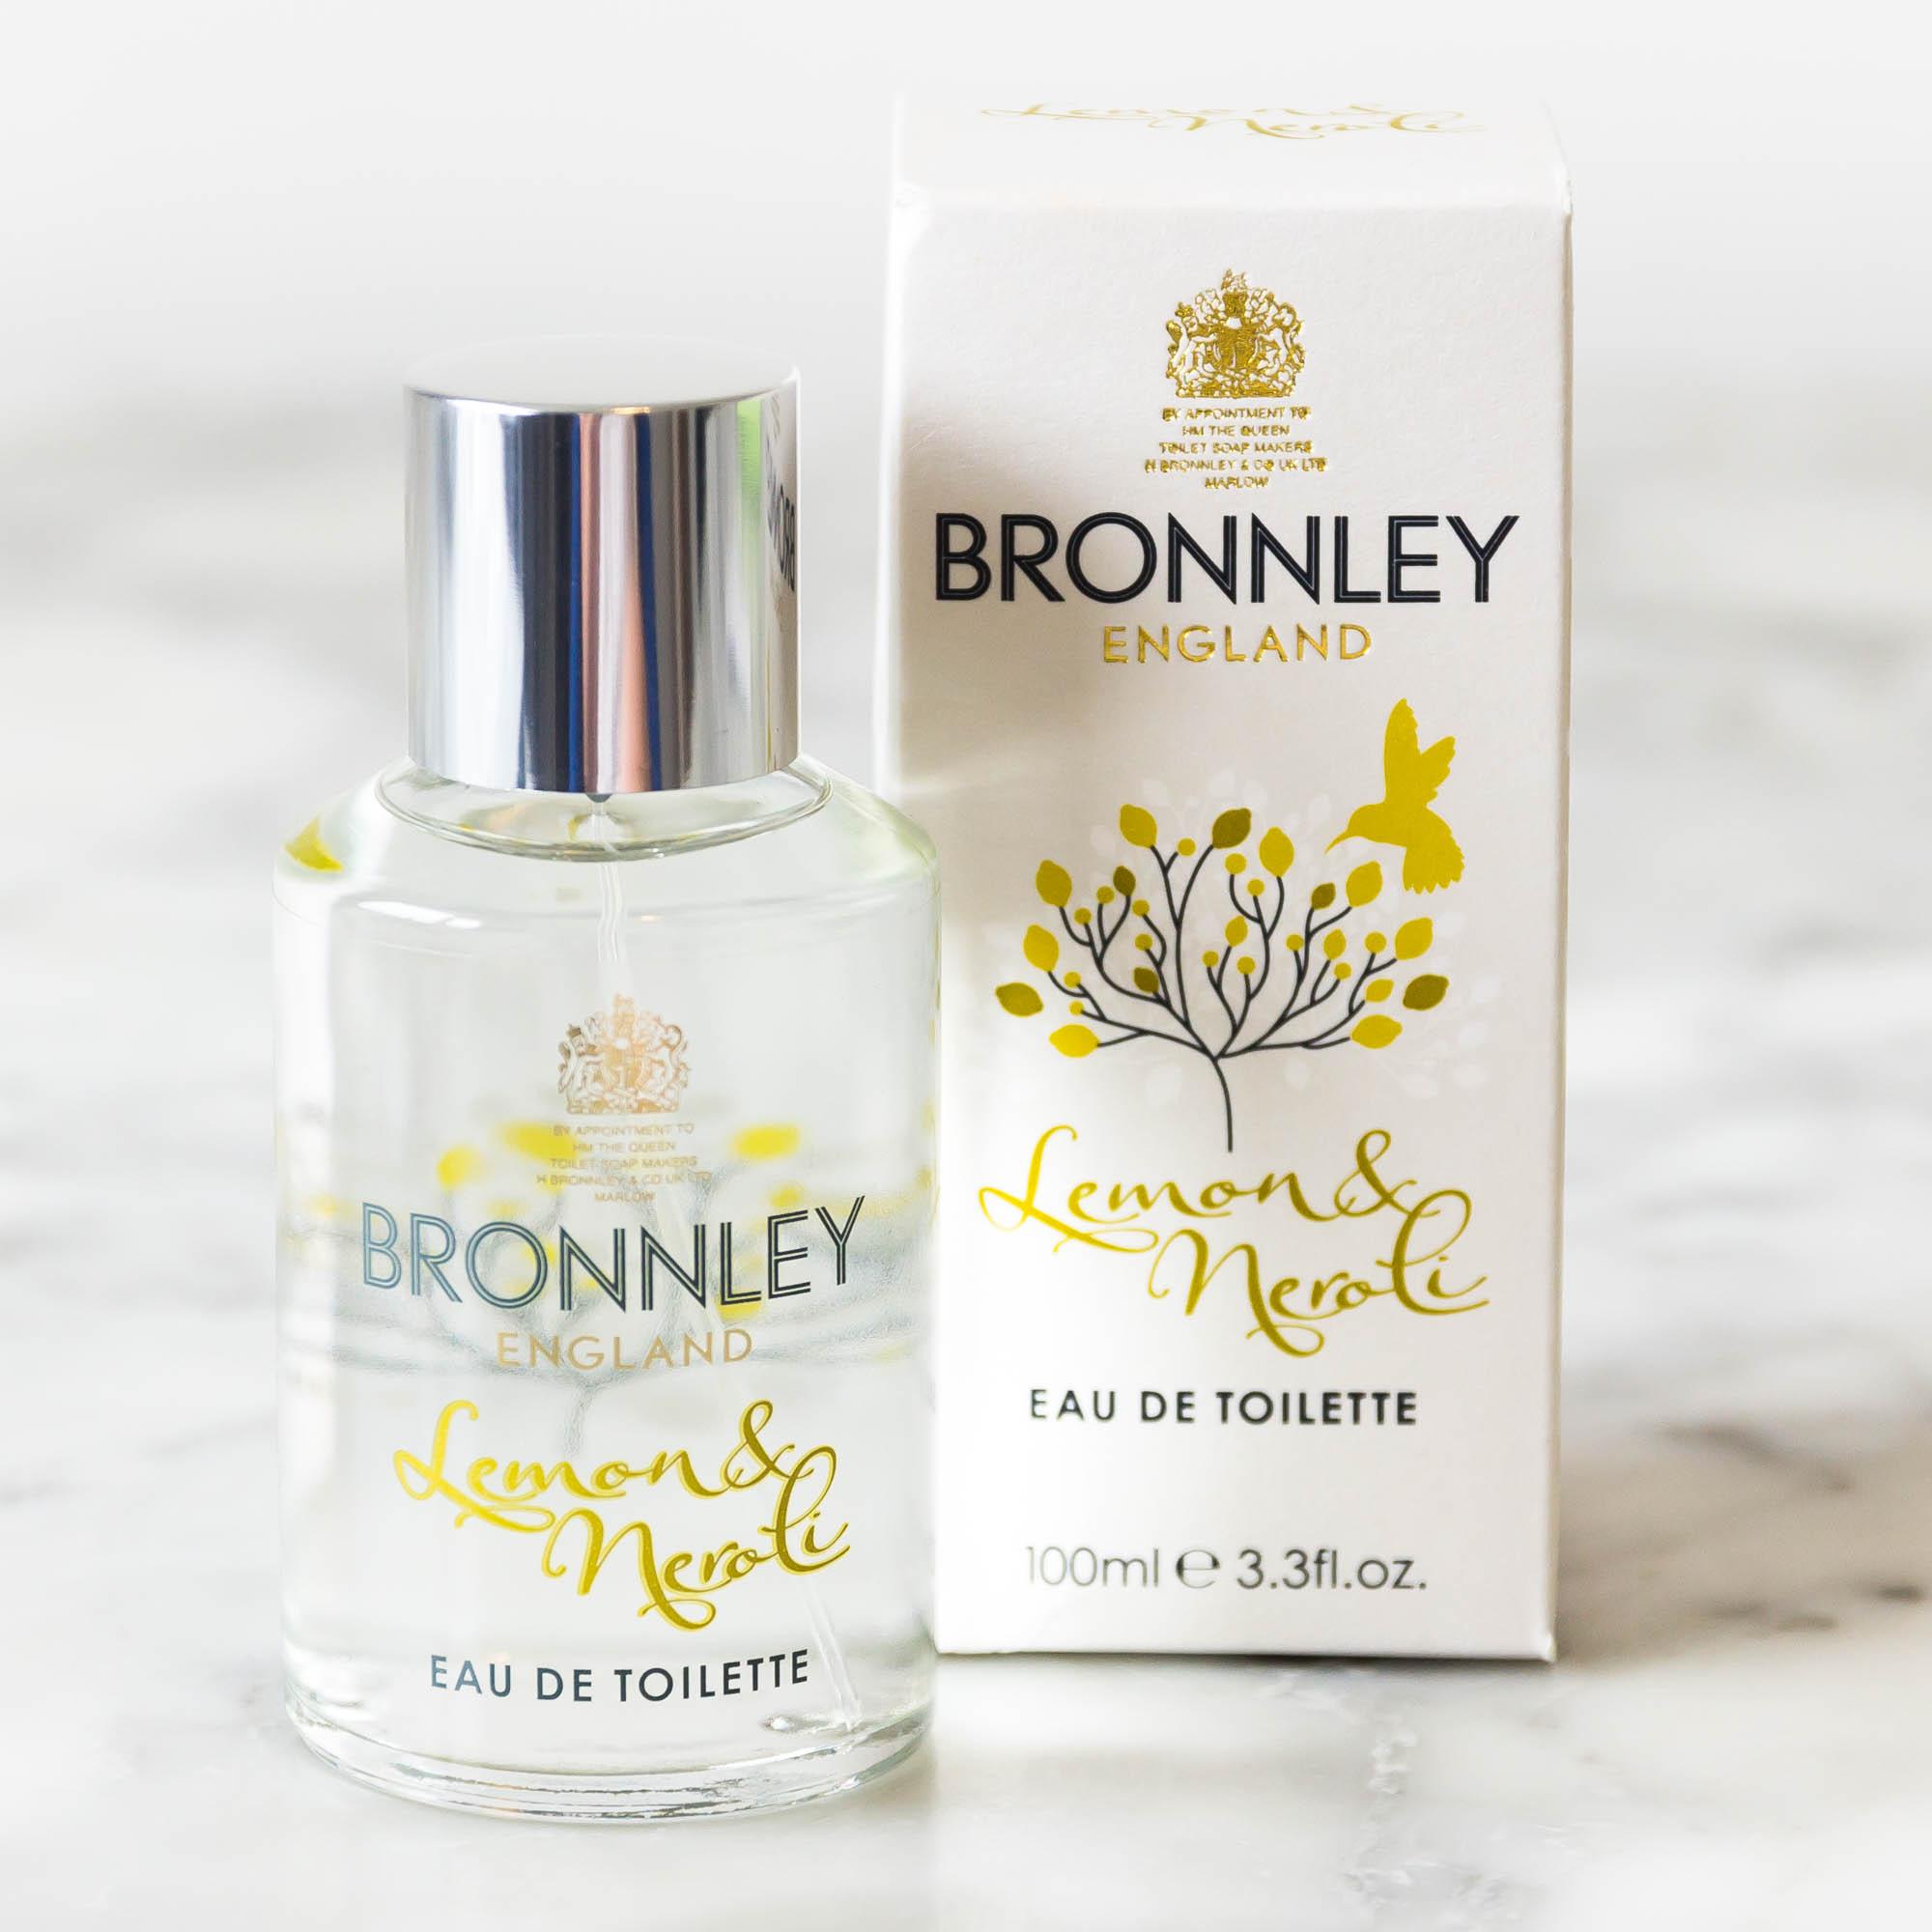 Bronnley England